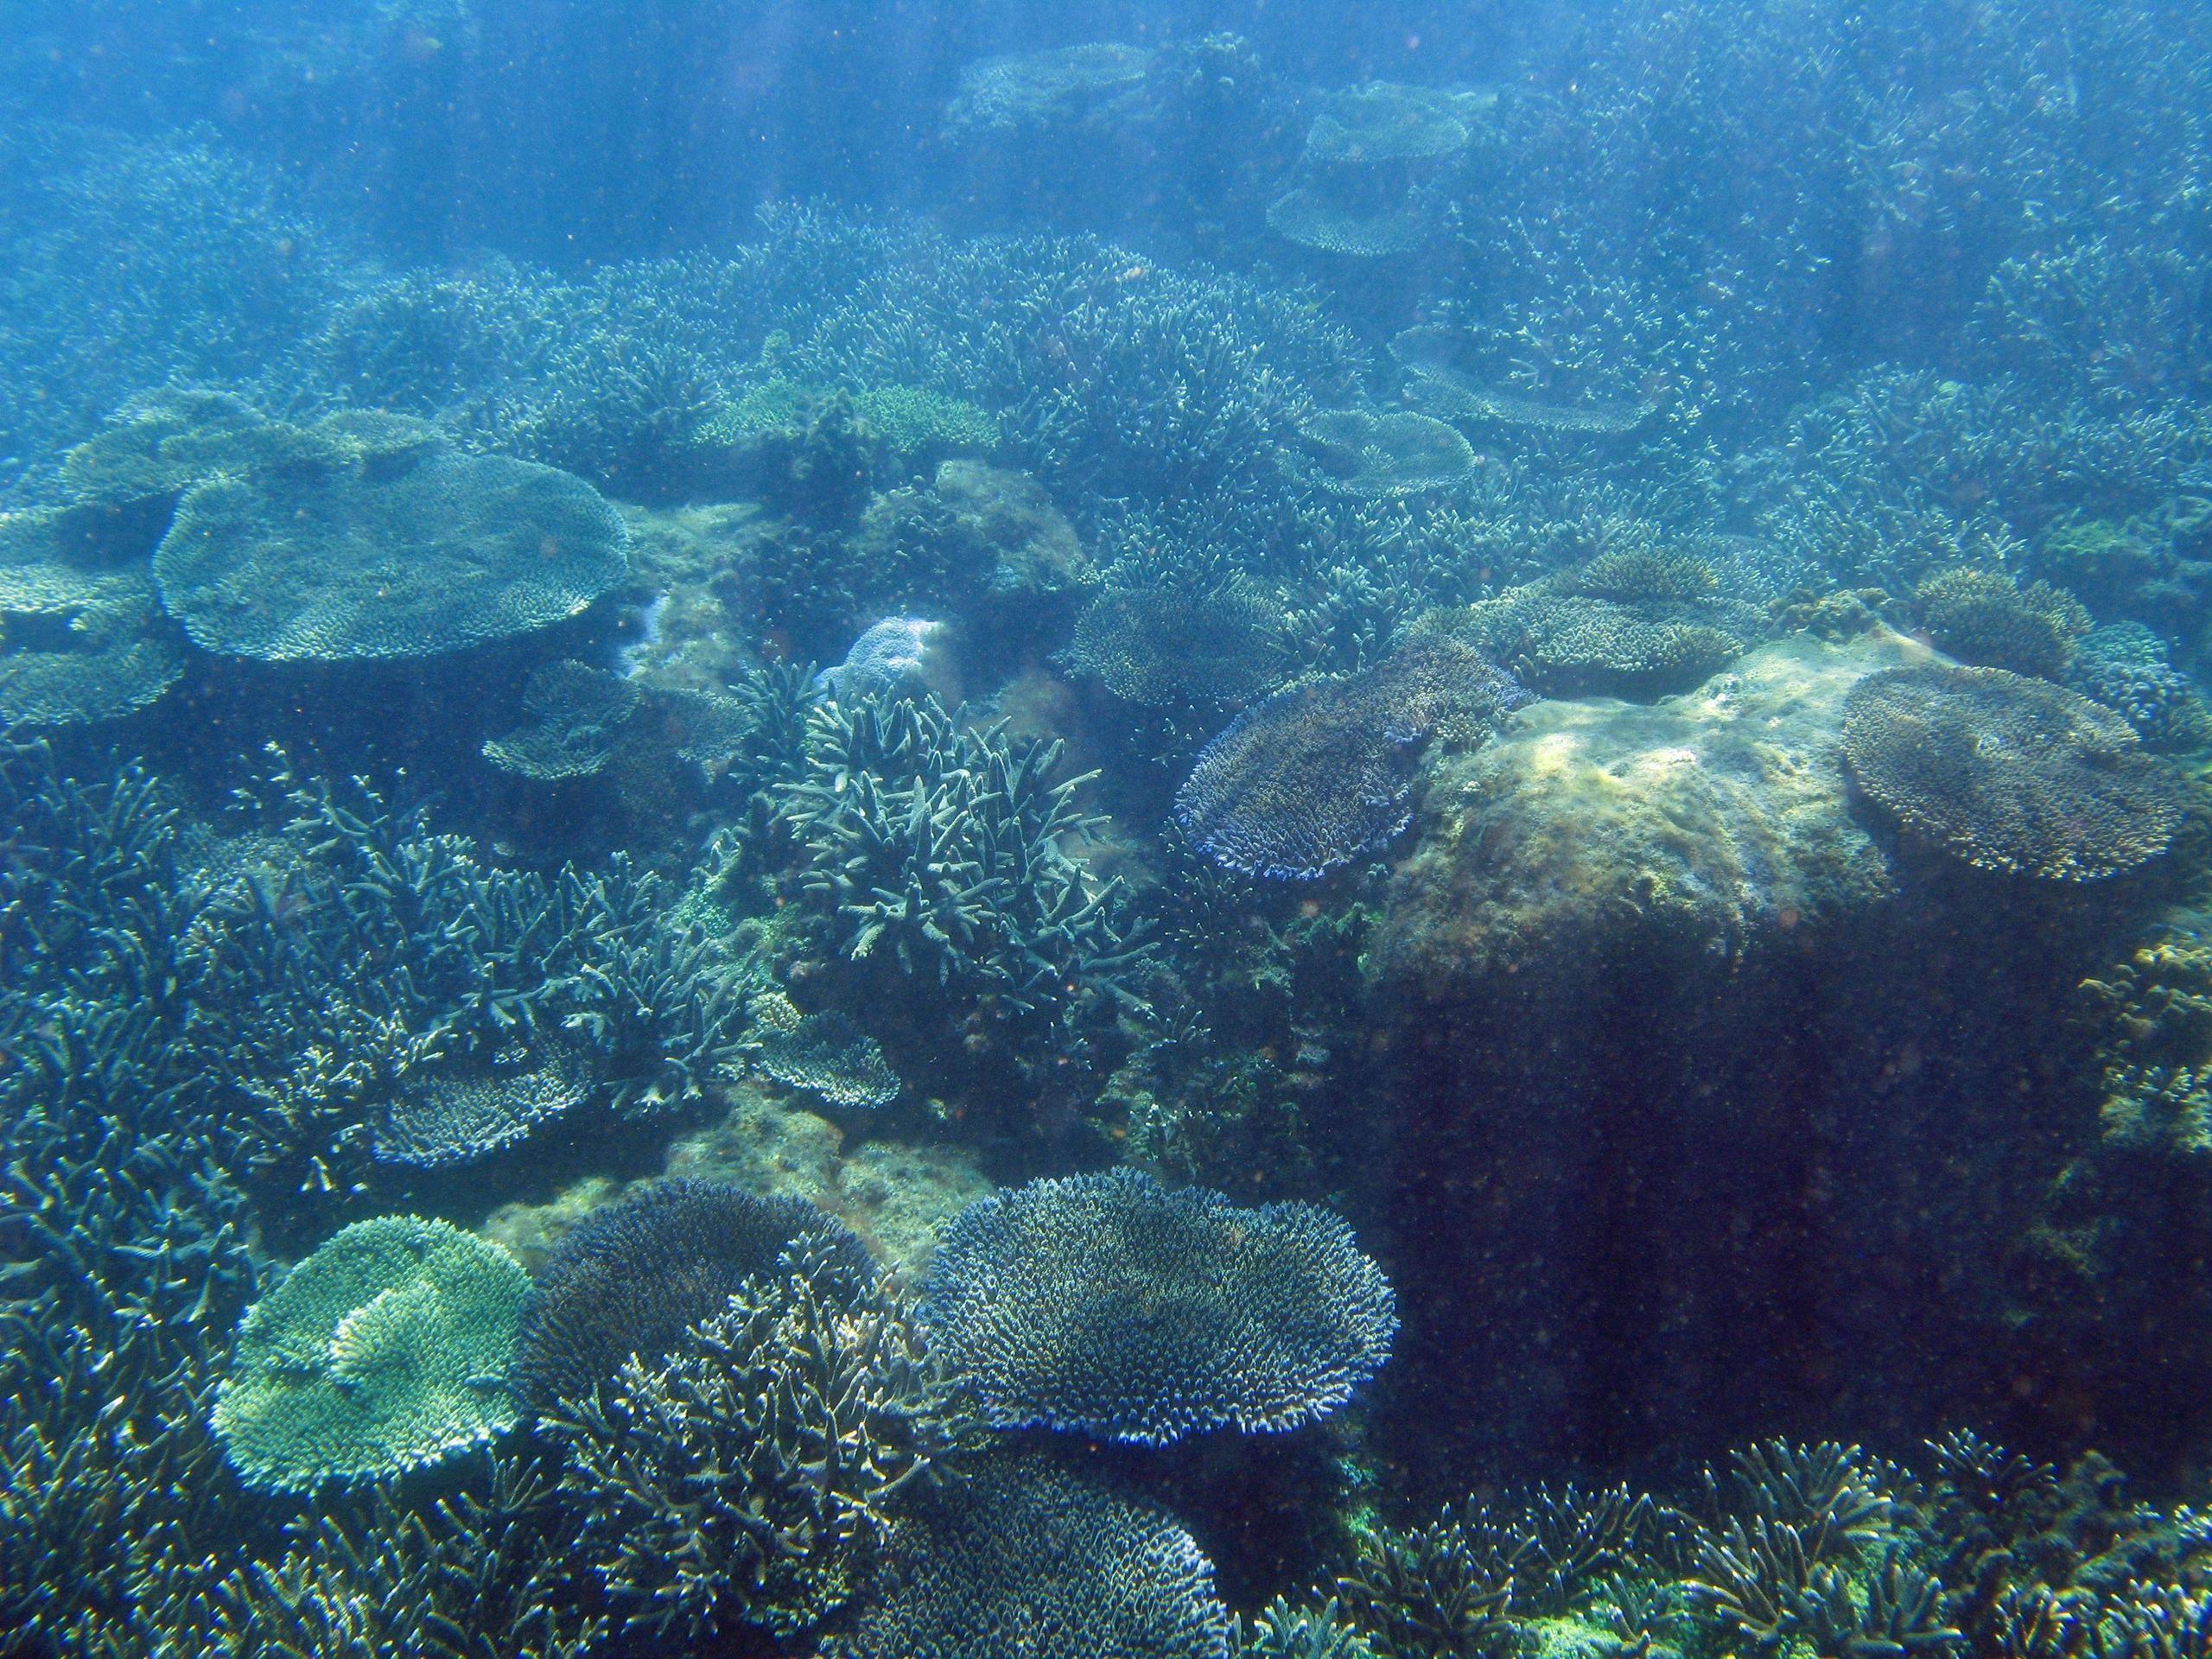 Ocean Floor Wallpapers – Wallpaper Cave · wallpapercave.com